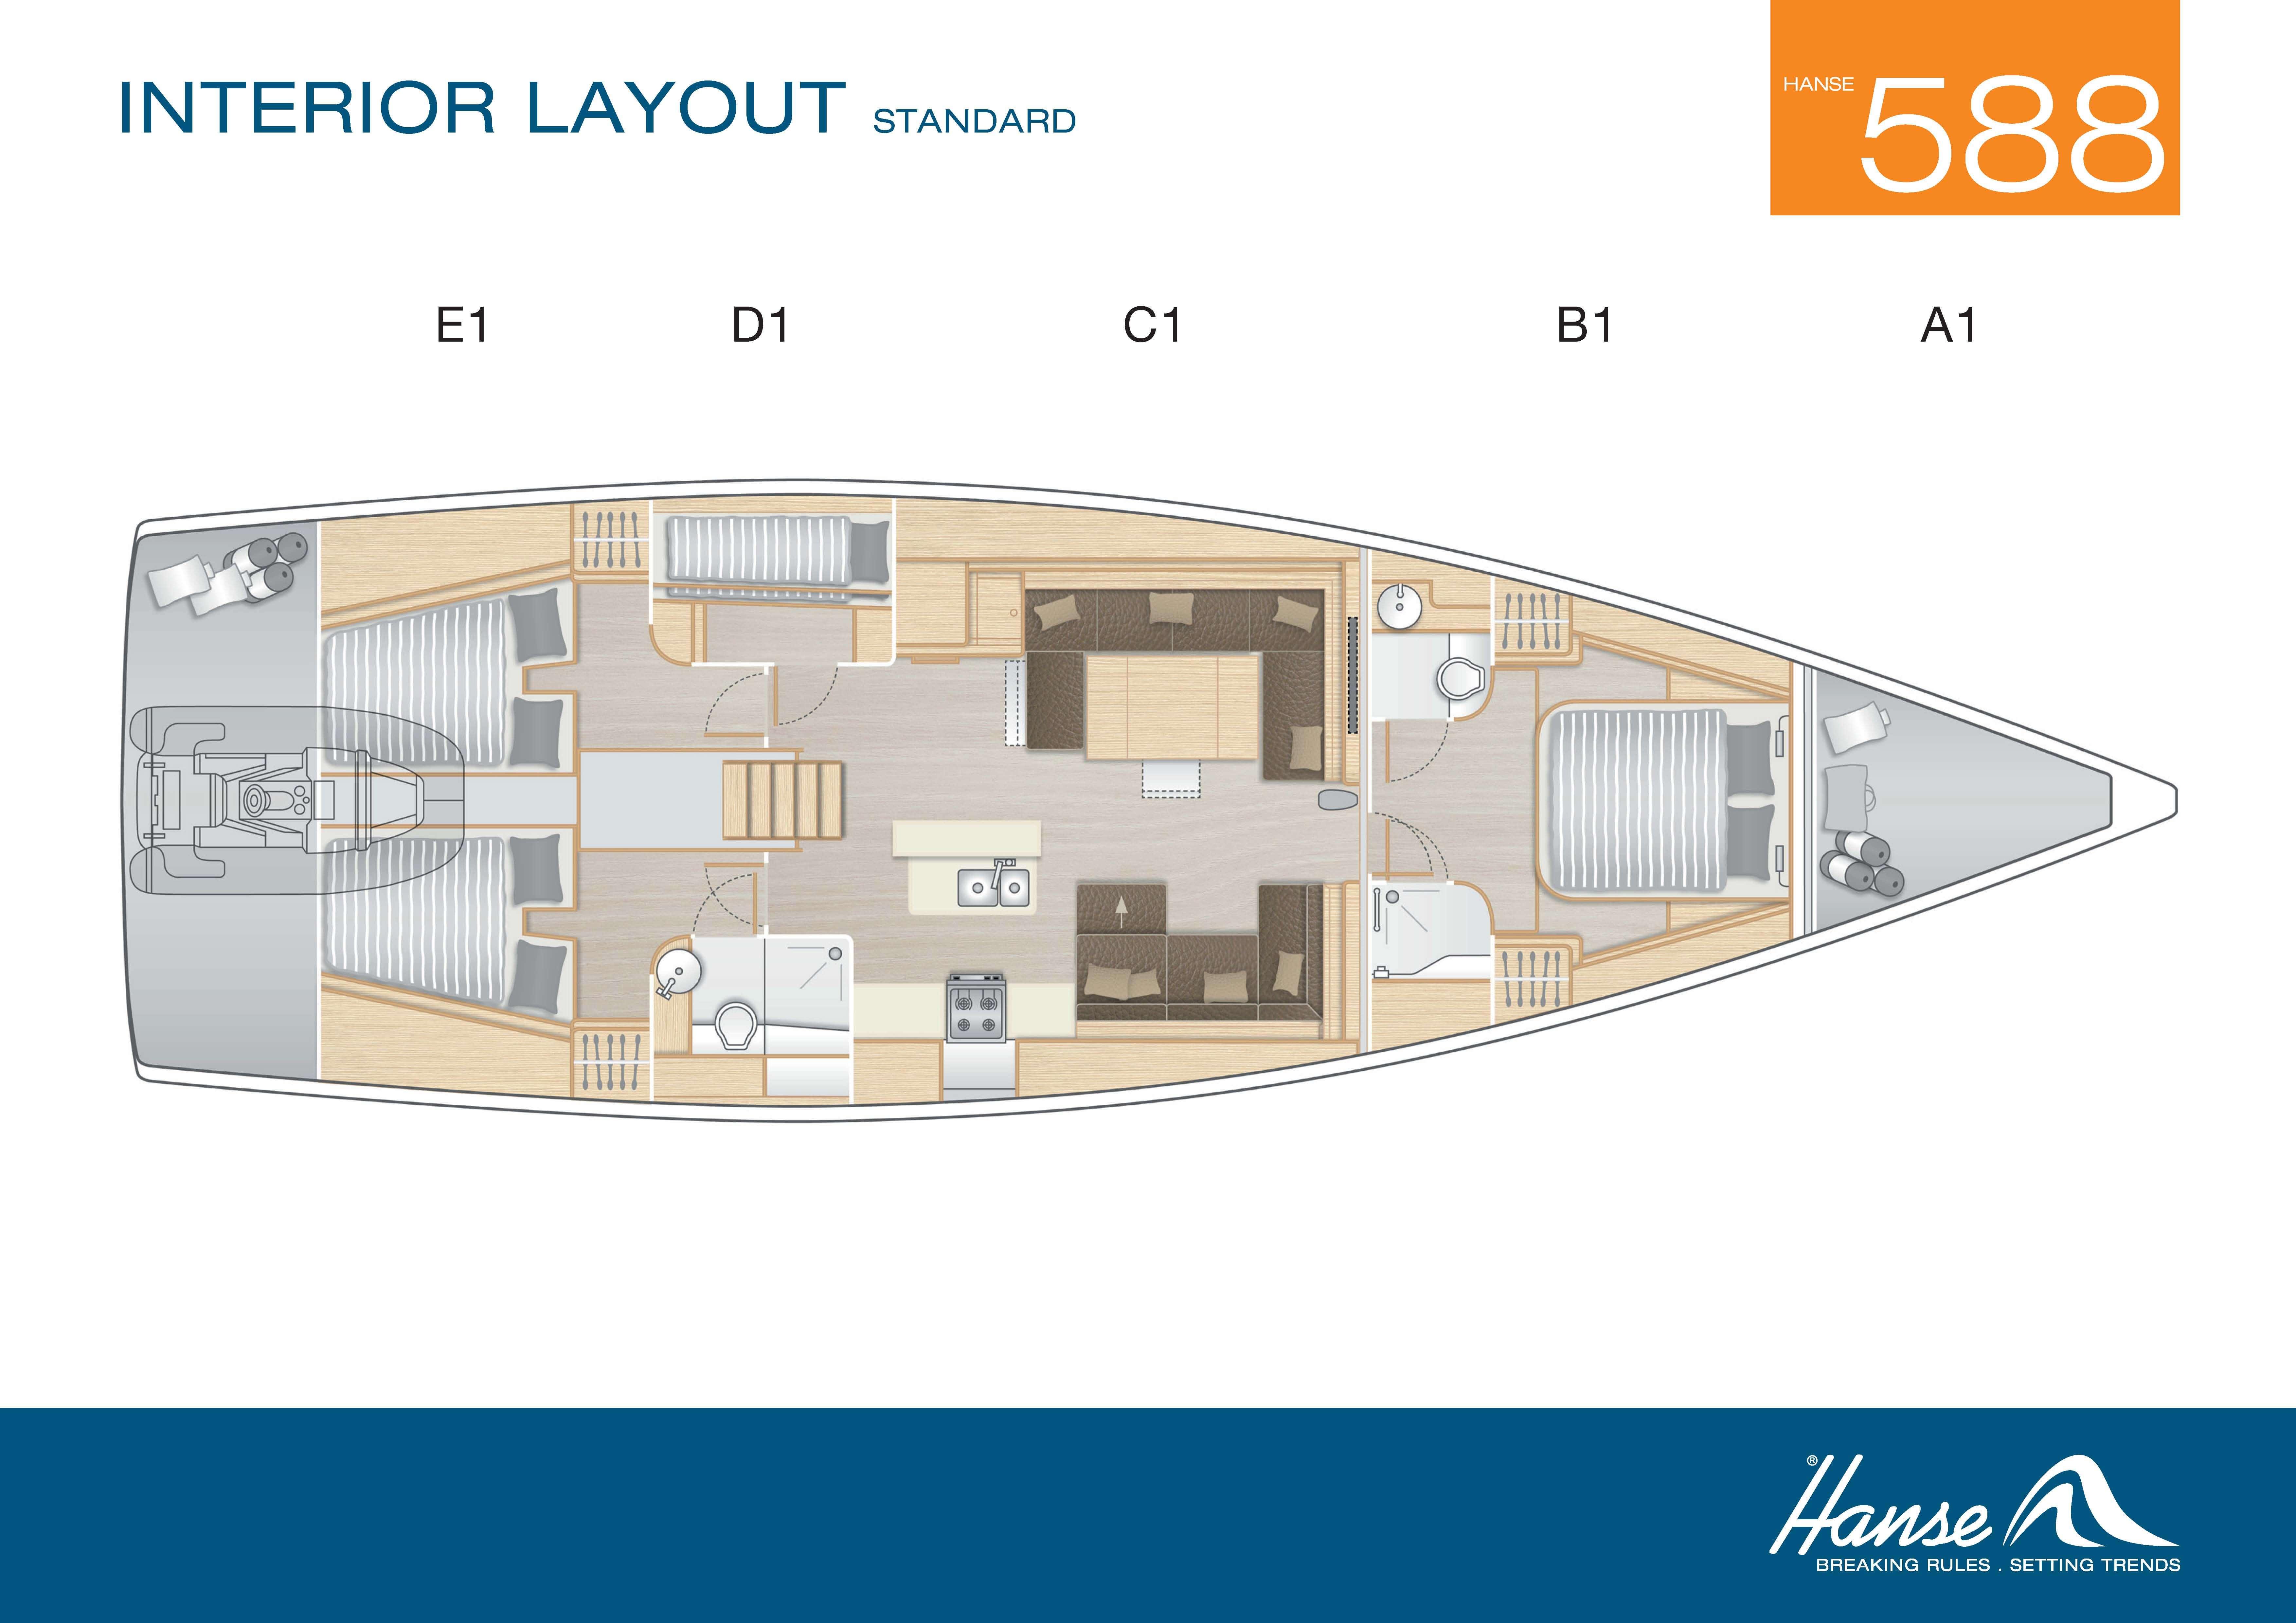 hanse-layout_A1_B1_C1_D1_E1